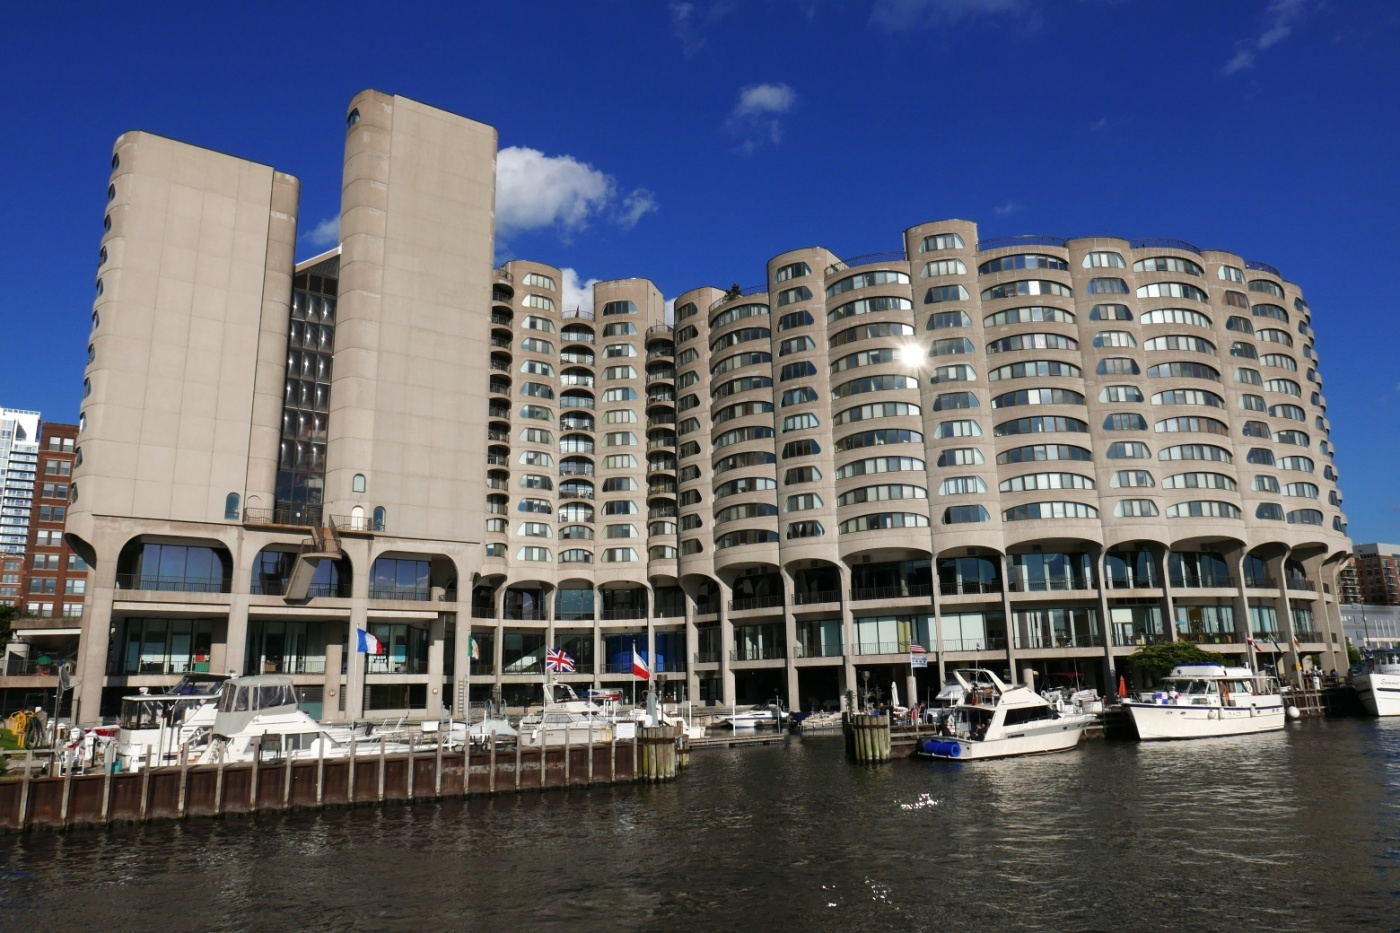 Bertrand Goldberg's River City